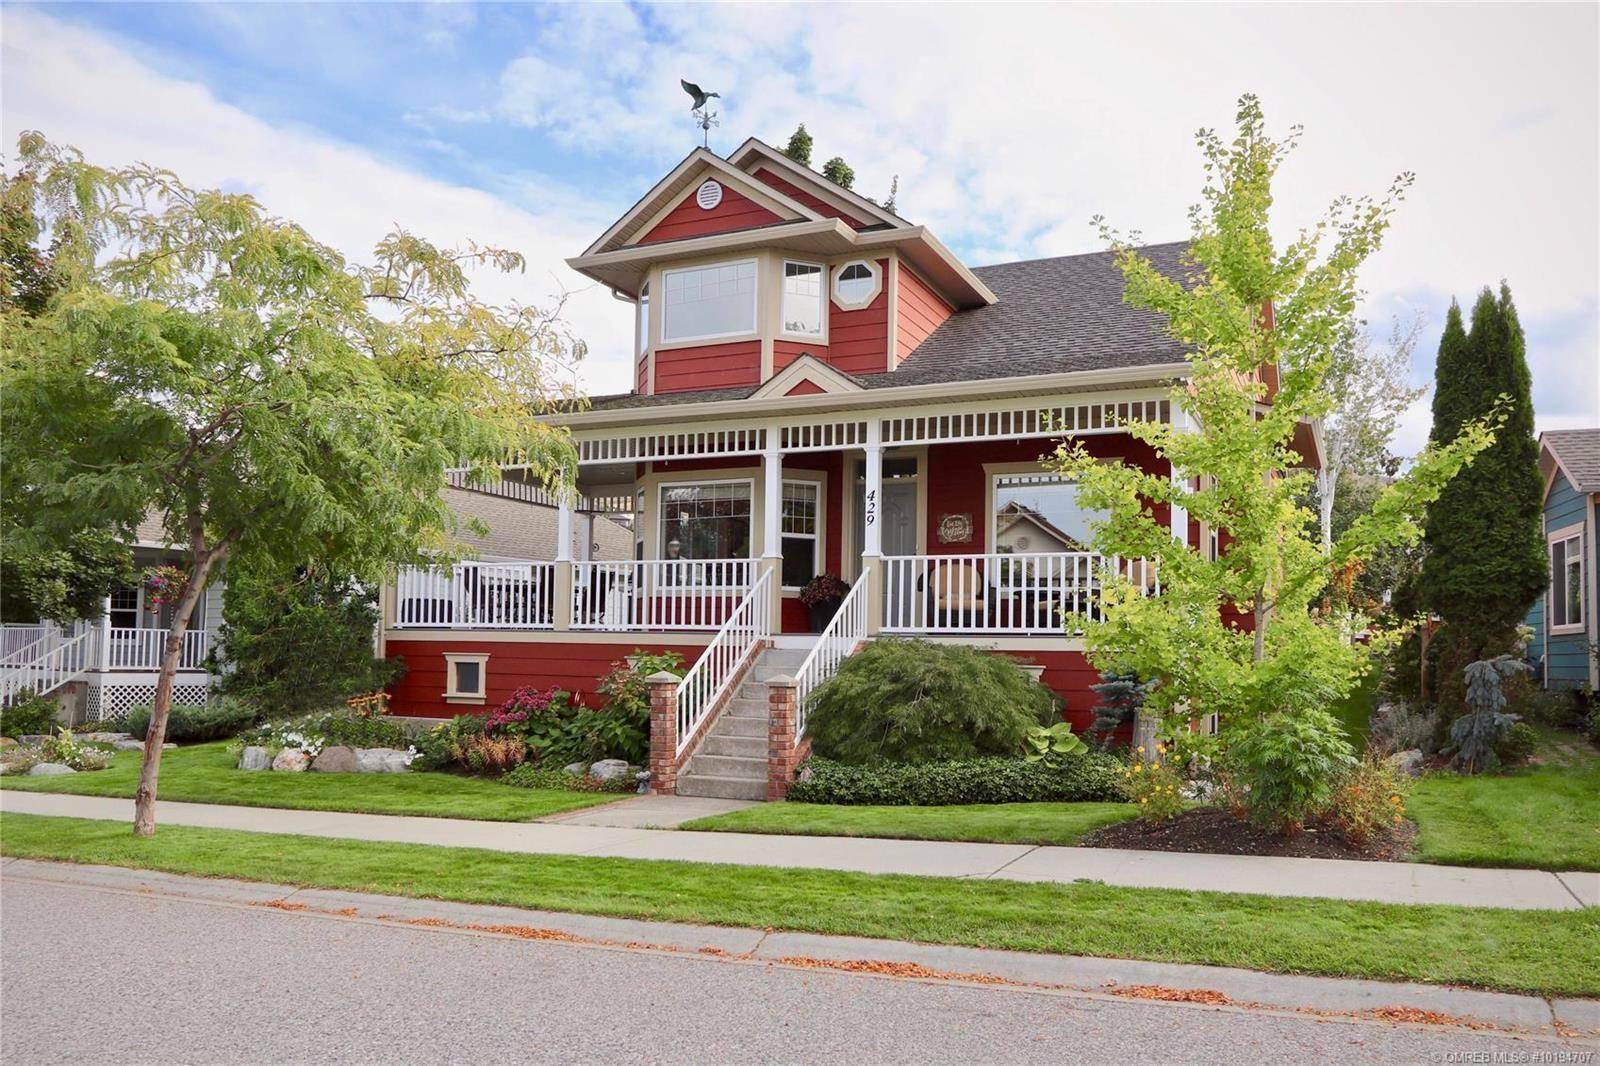 House for sale at 429 Tulameen Rd Kelowna British Columbia - MLS: 10194707